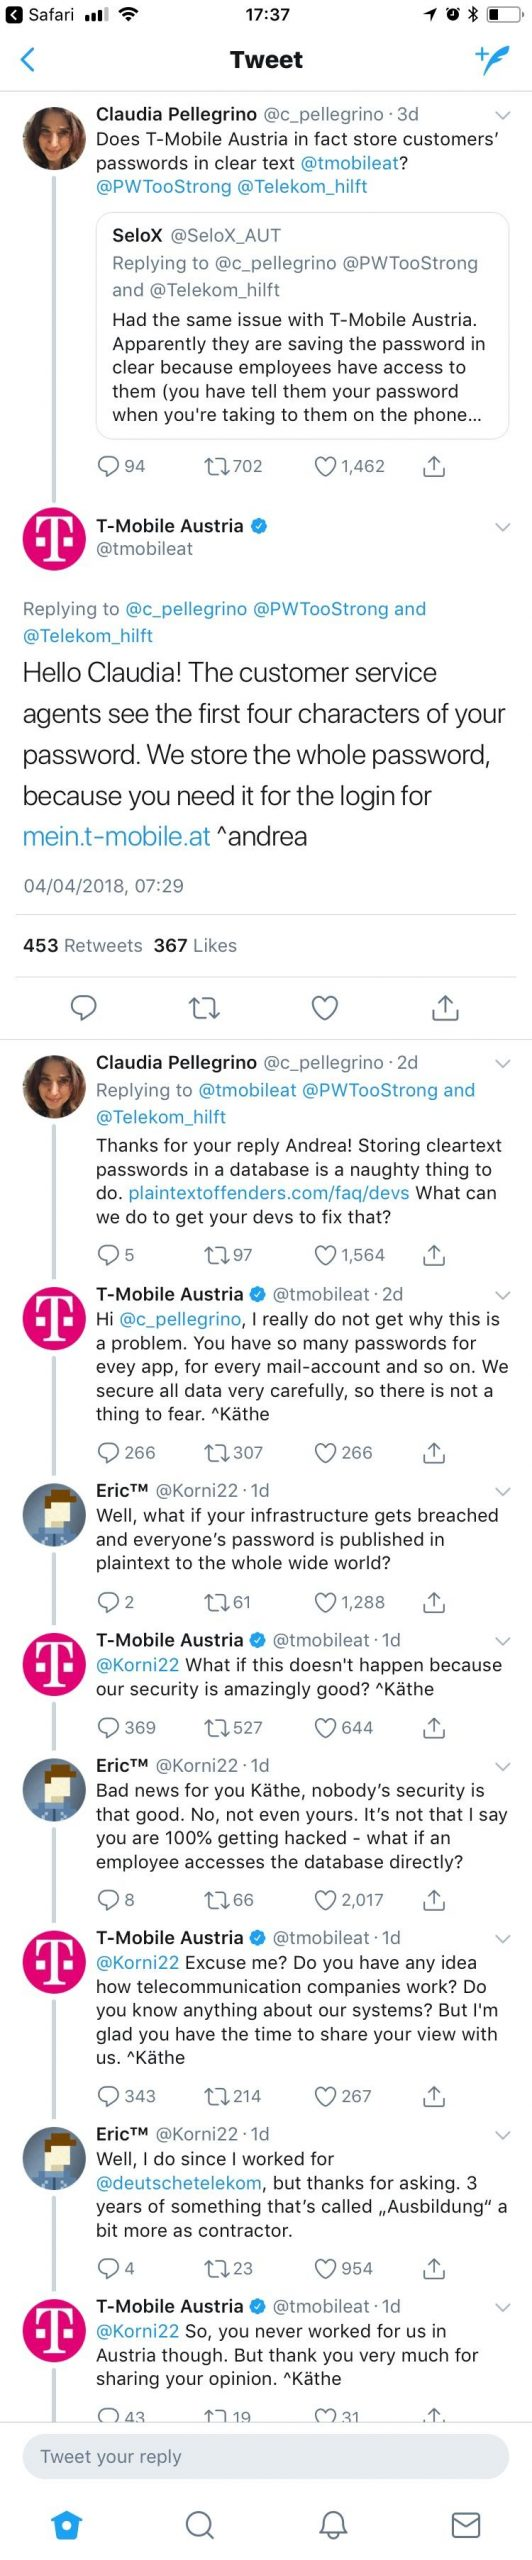 "Most of the thread of T Mobile Austria's ""super secure"" password storing techniques | tech-memes, art-memes, data-memes, password-memes, security-memes, devs-memes, database-memes, fix-memes, qa-memes, IT-memes, rds-memes, idea-memes, ide-memes, retweet-memes | ProgrammerHumor.io"